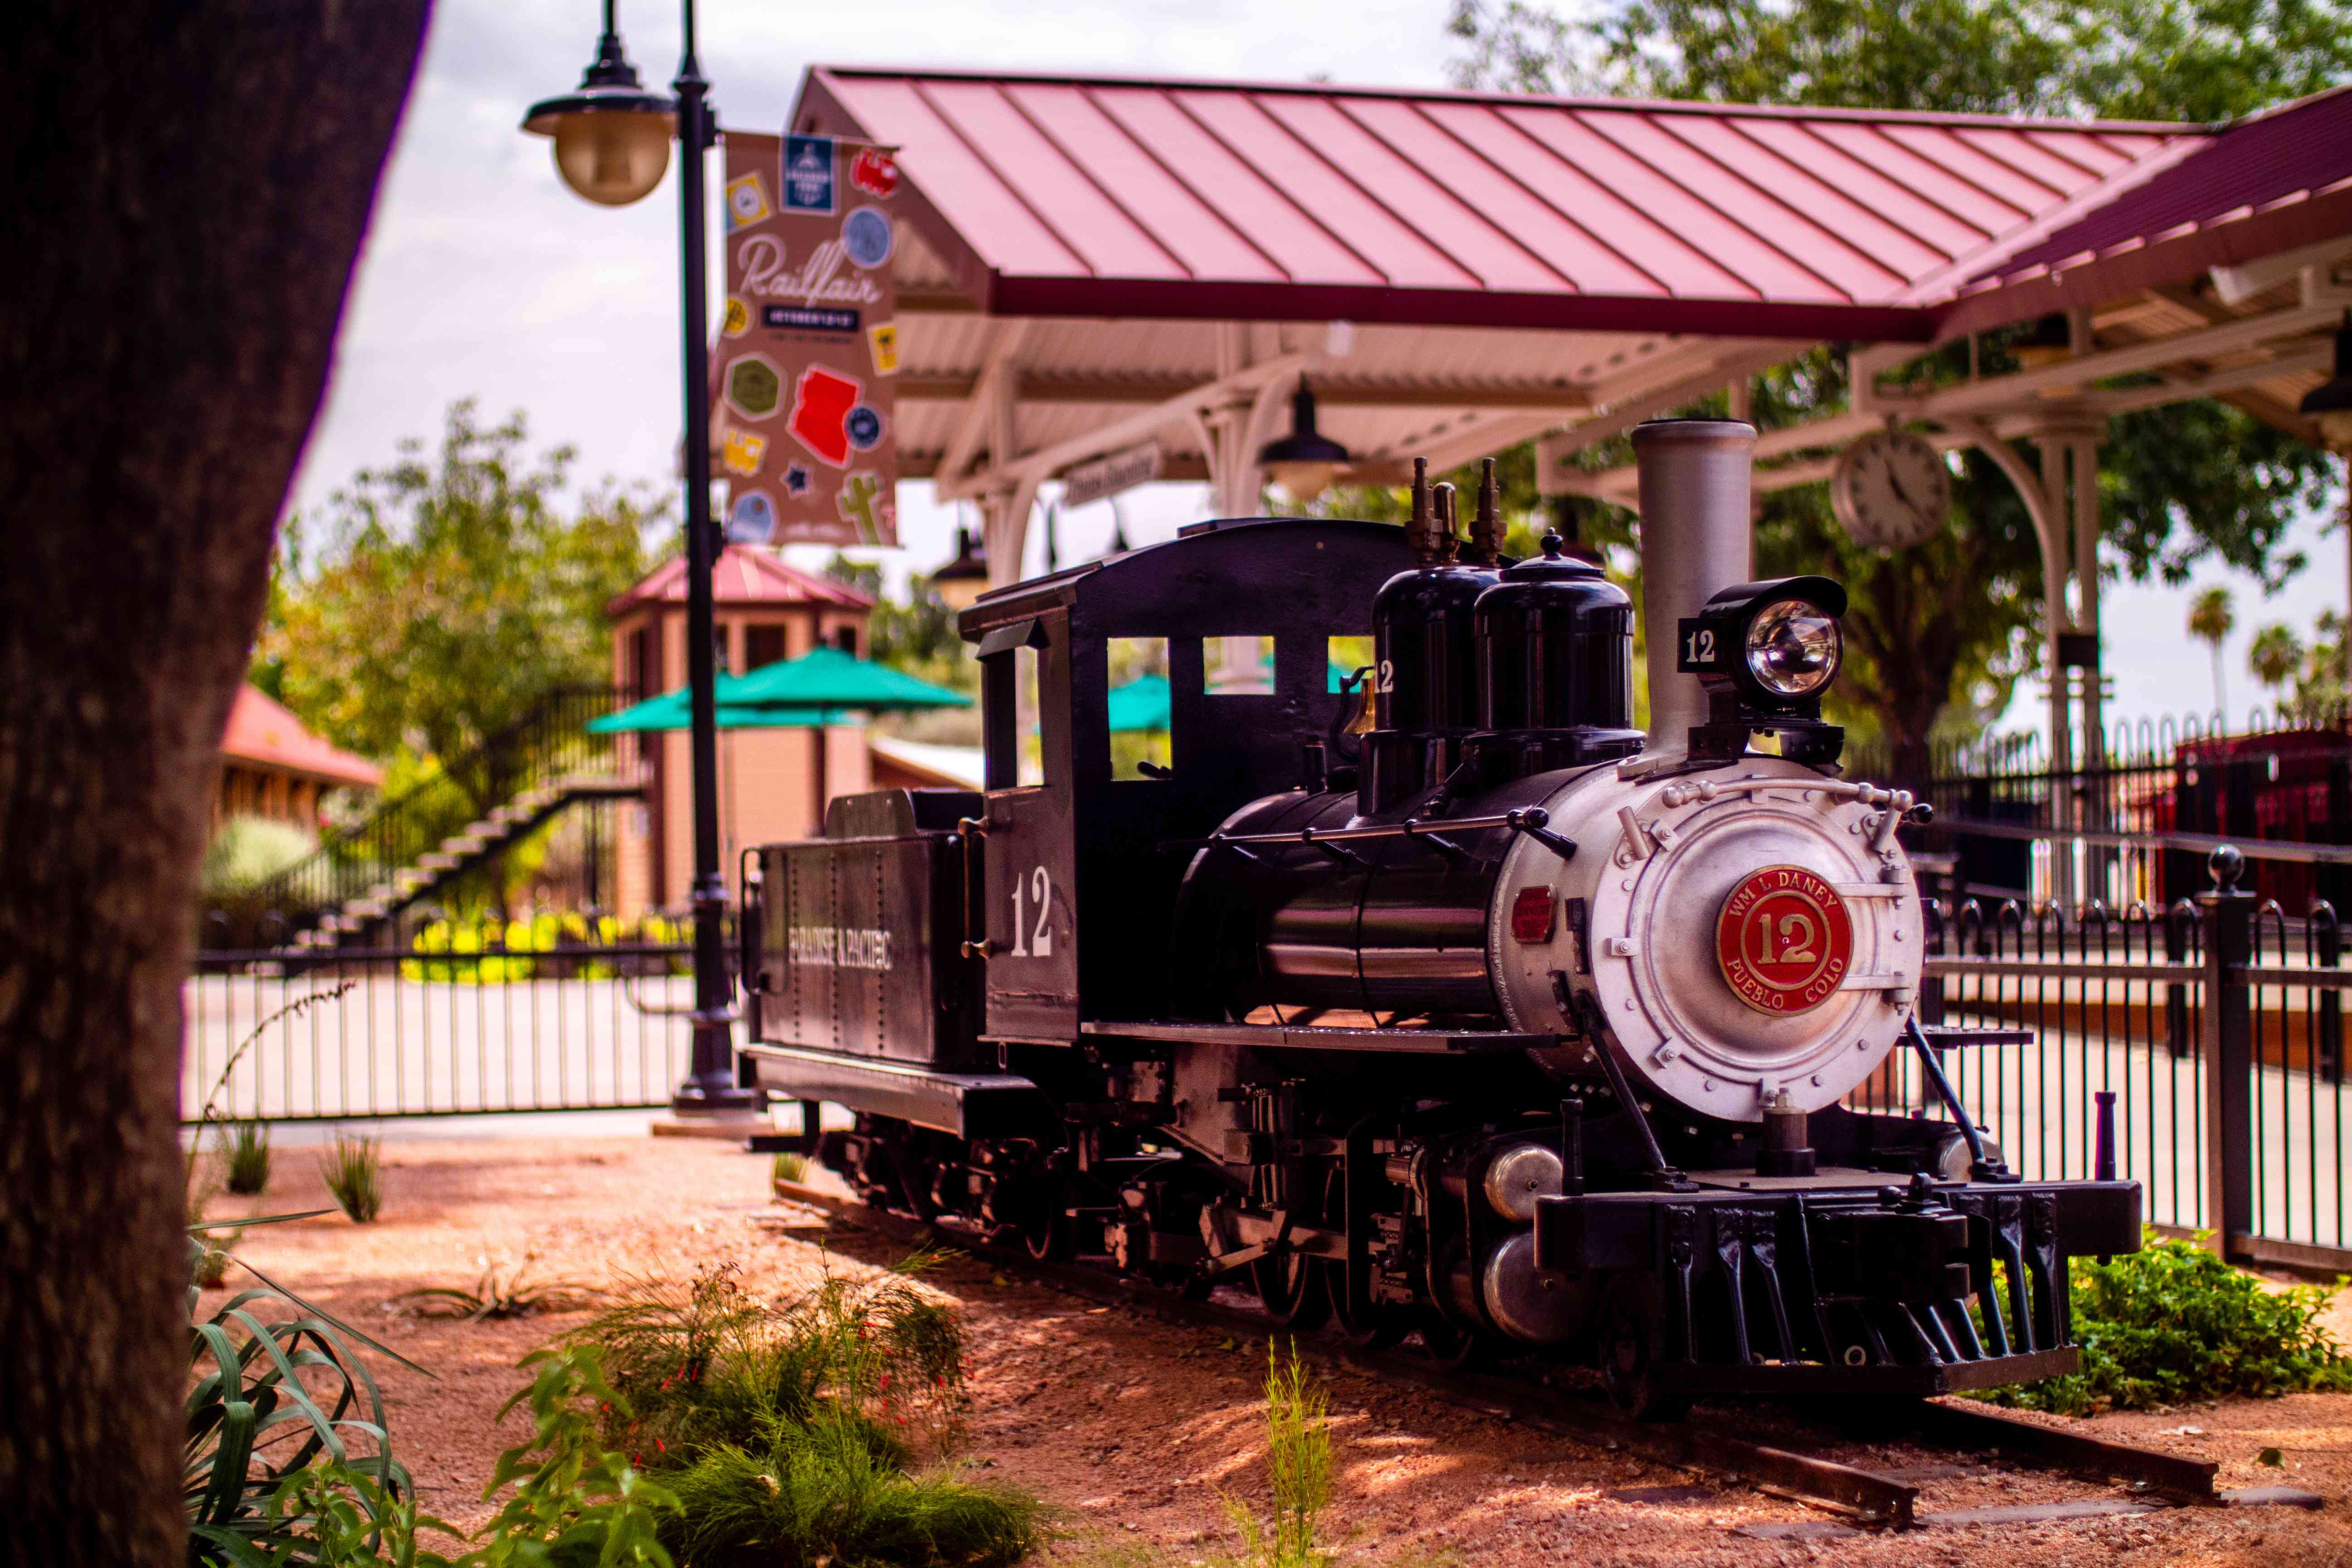 McCormick Stillman Railroad Park in Scottsdale, Arizona